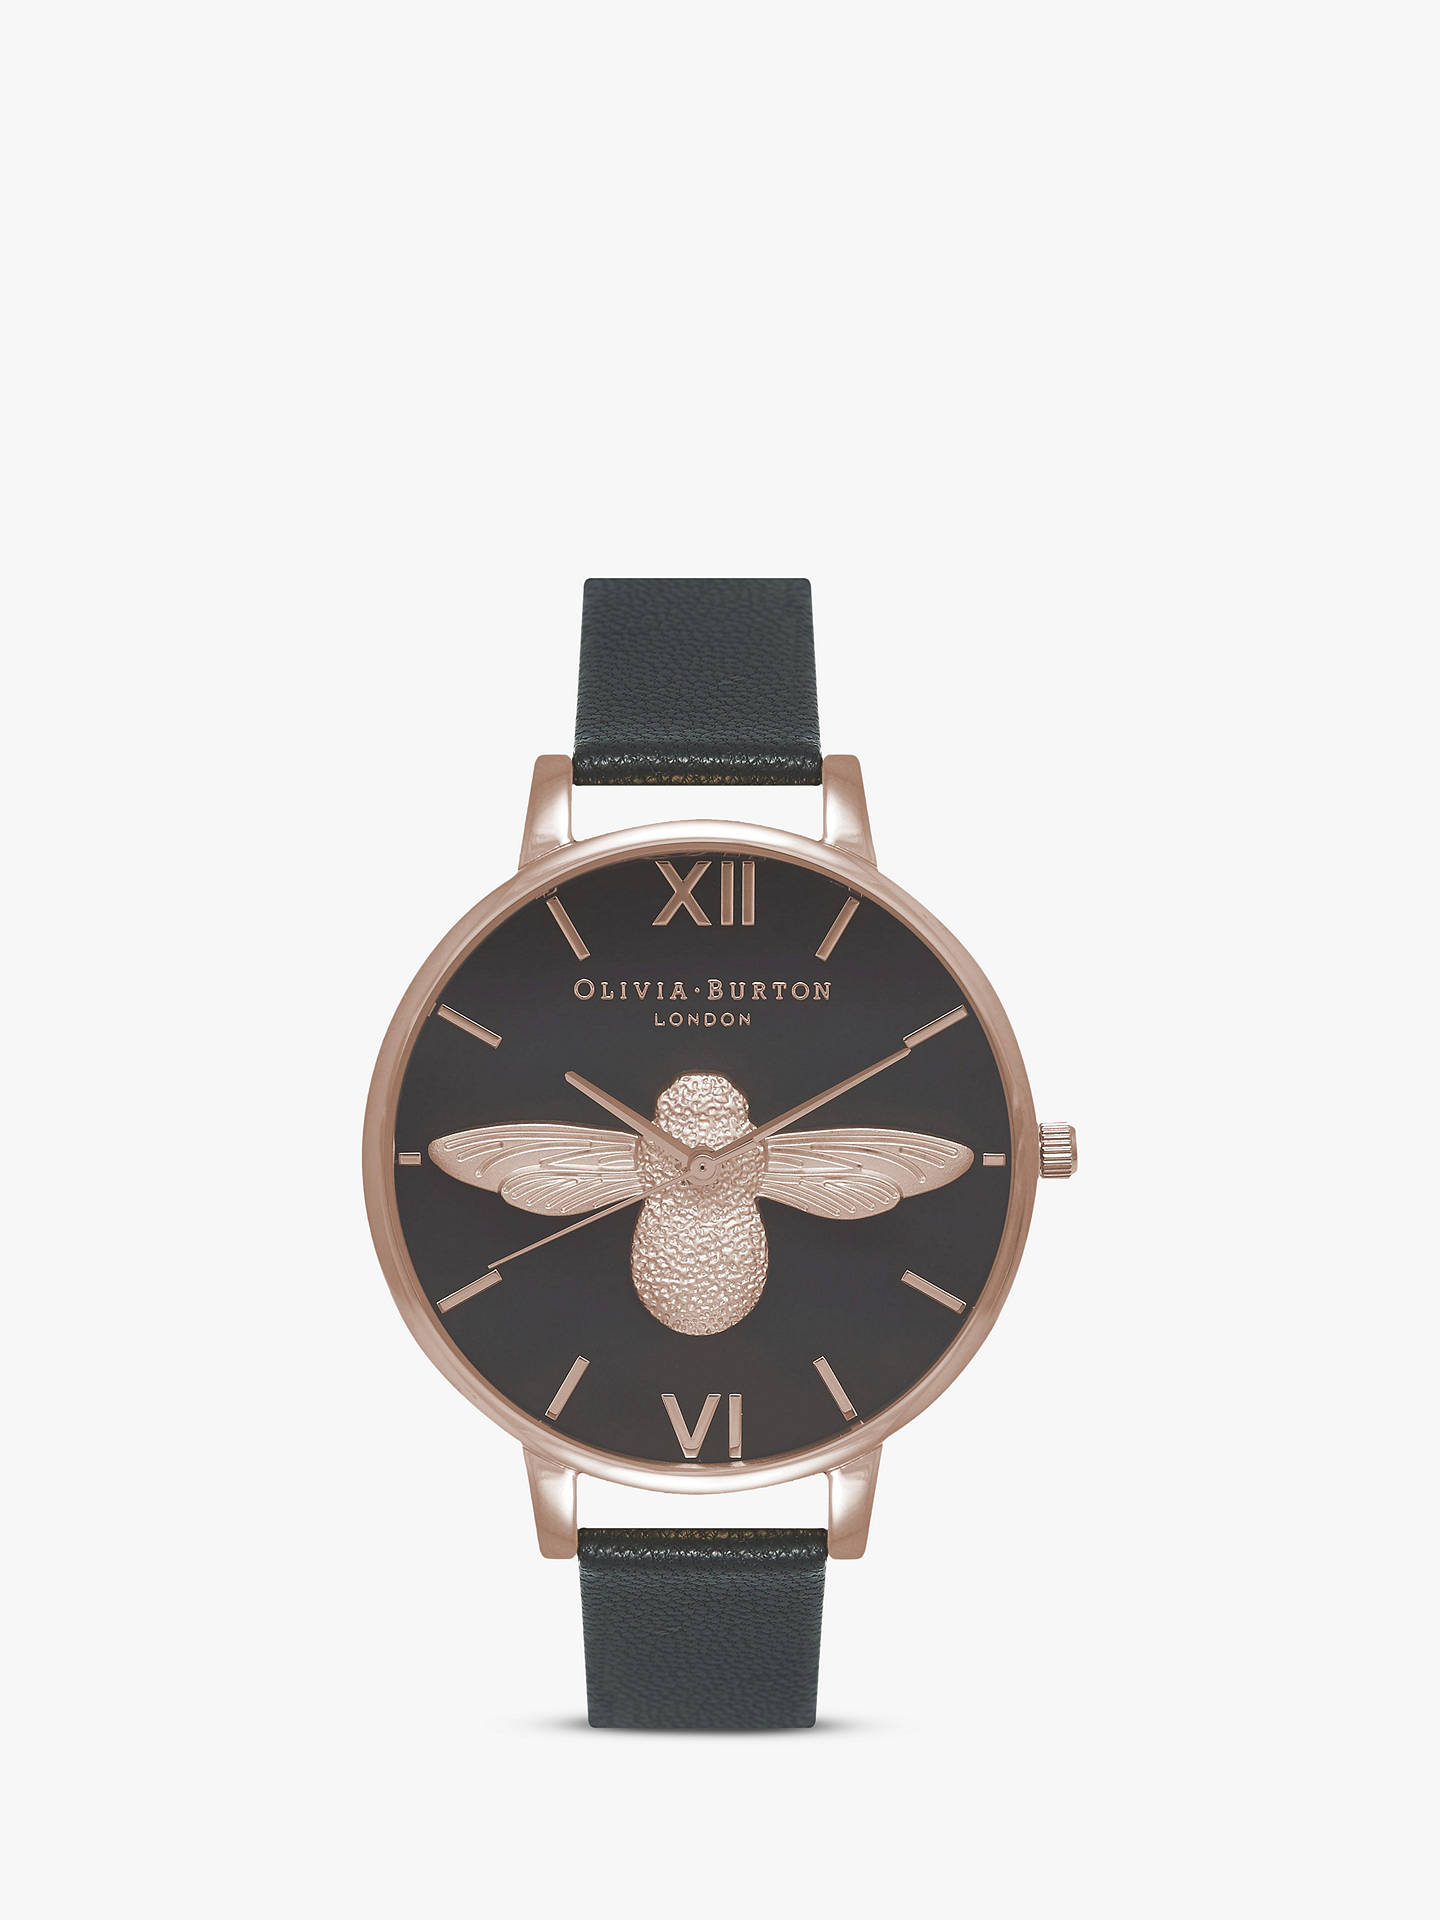 357155ee280 Buy Olivia Burton OB16AM98 Women's Animal Motifs Bee Leather Strap Watch,  Black/Rose Gold ...